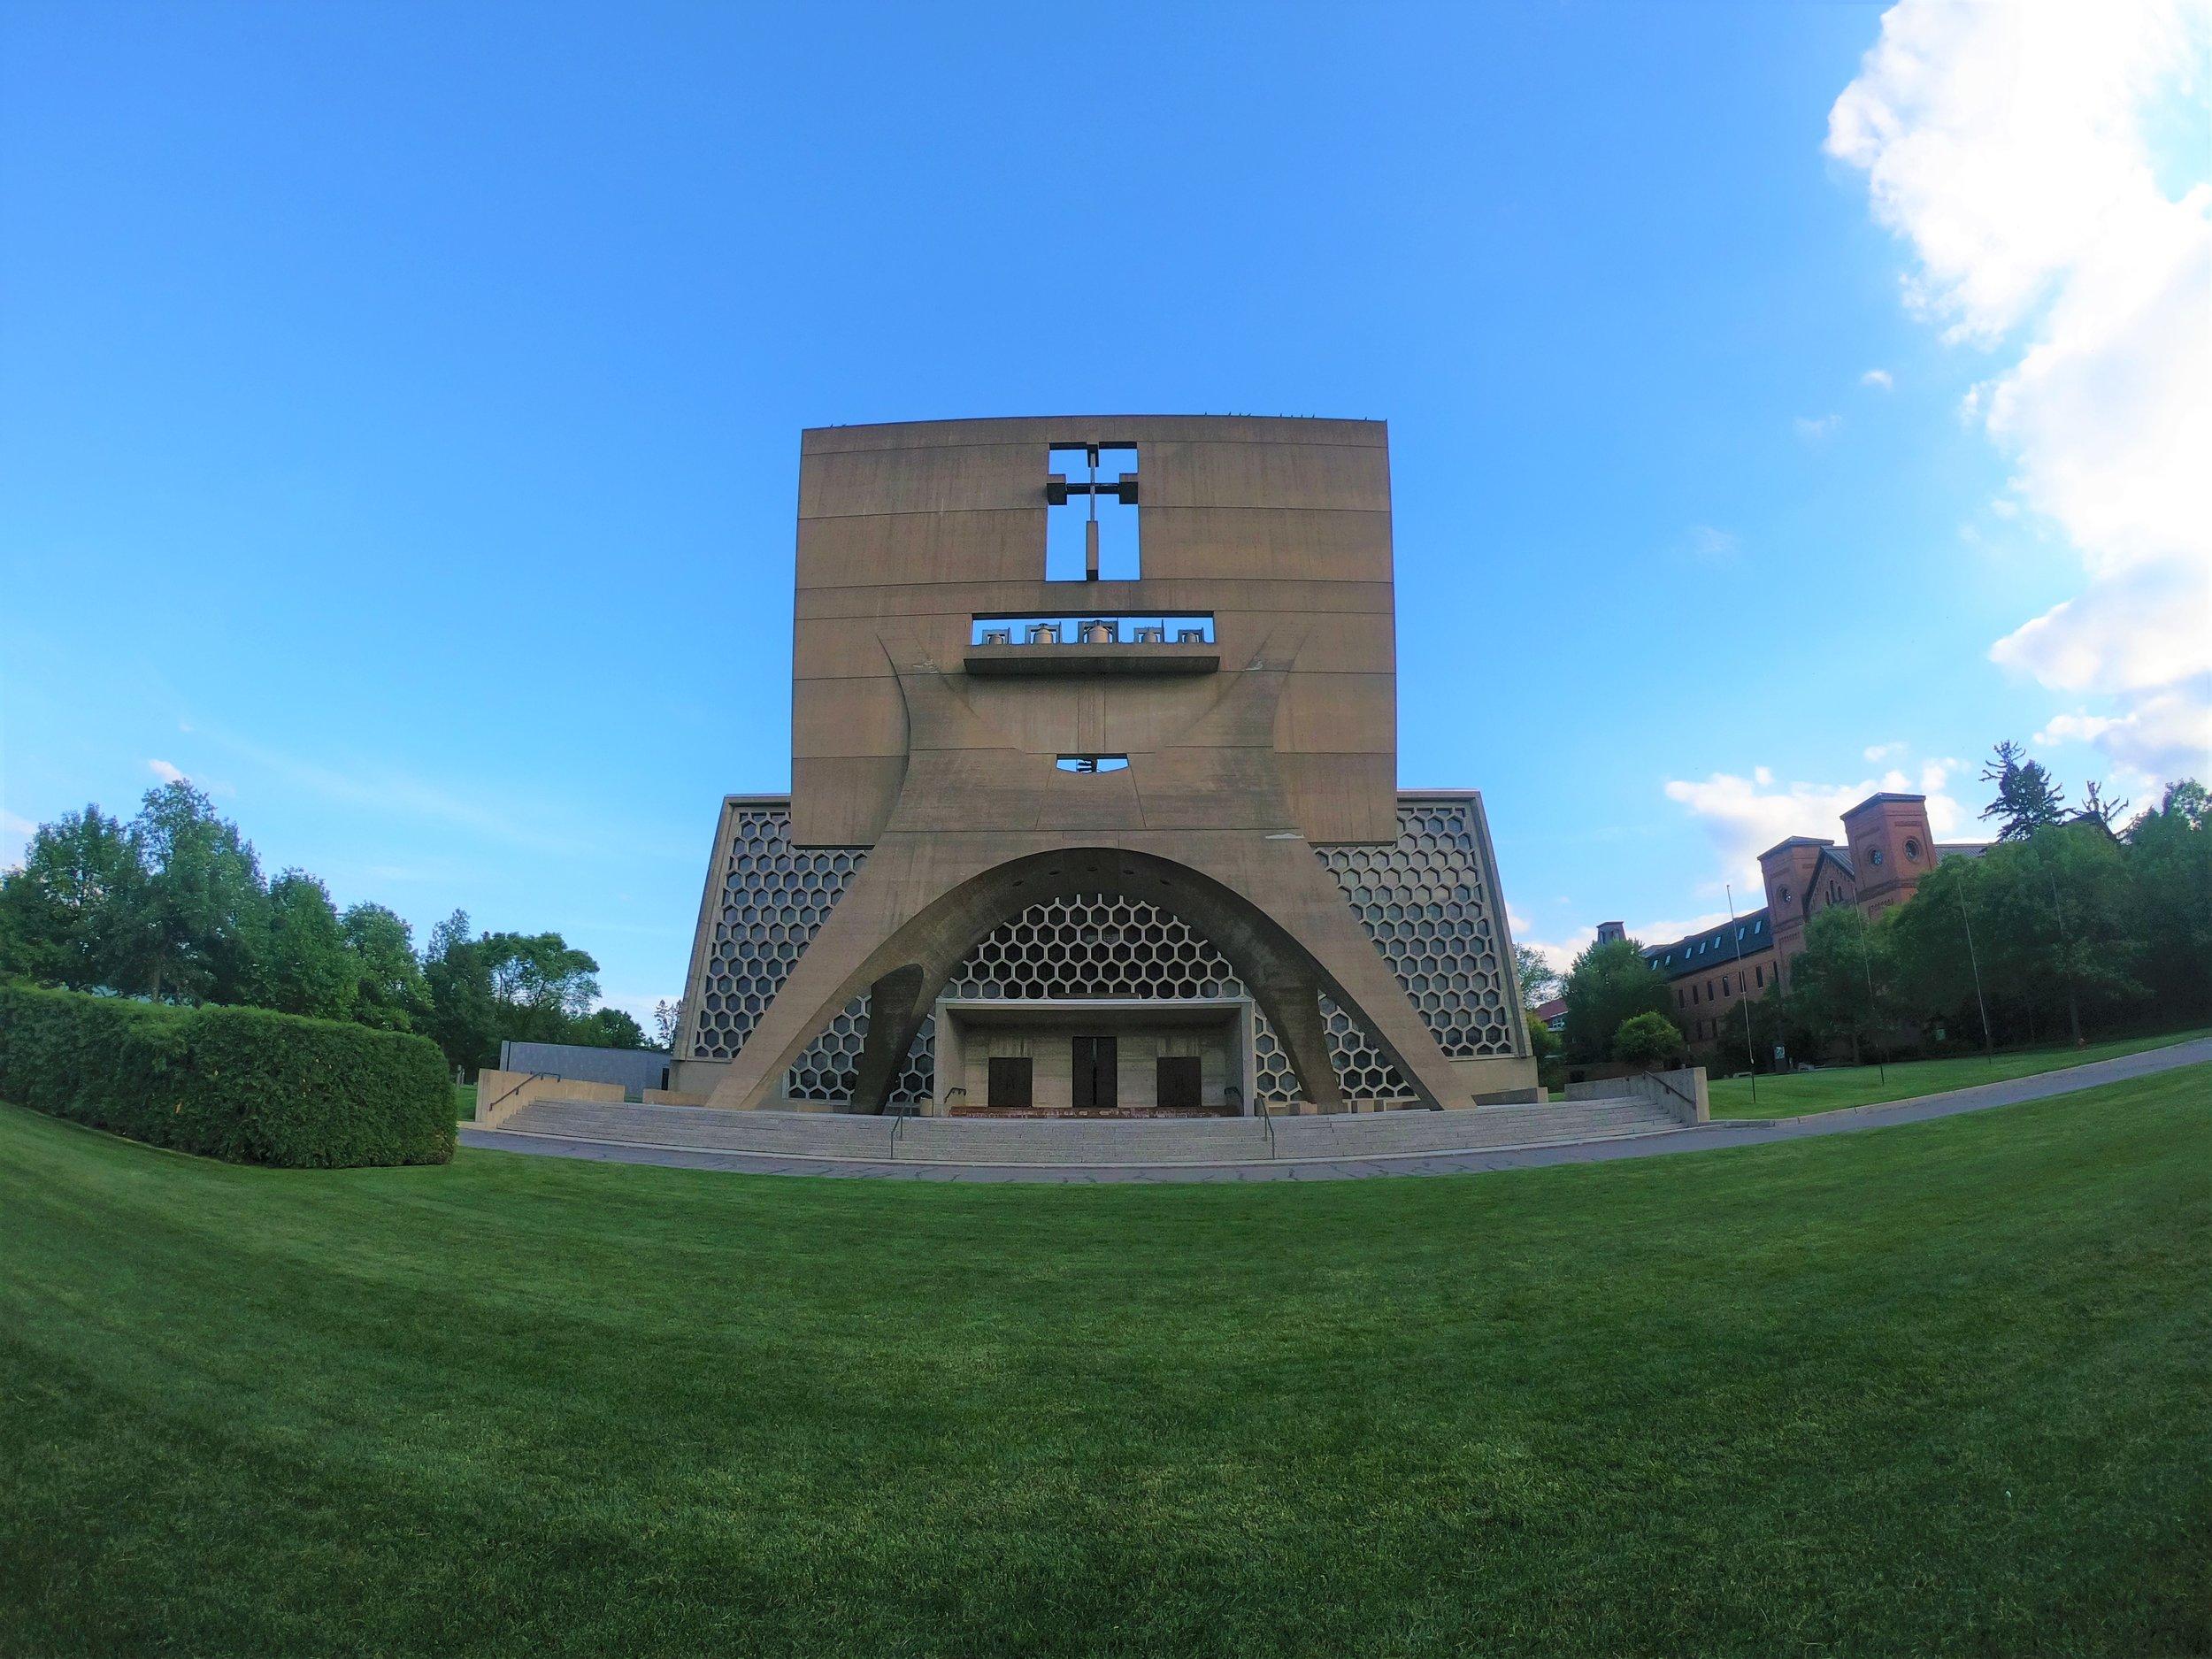 St. John's Abbey Church in St. Joseph, Minnesota